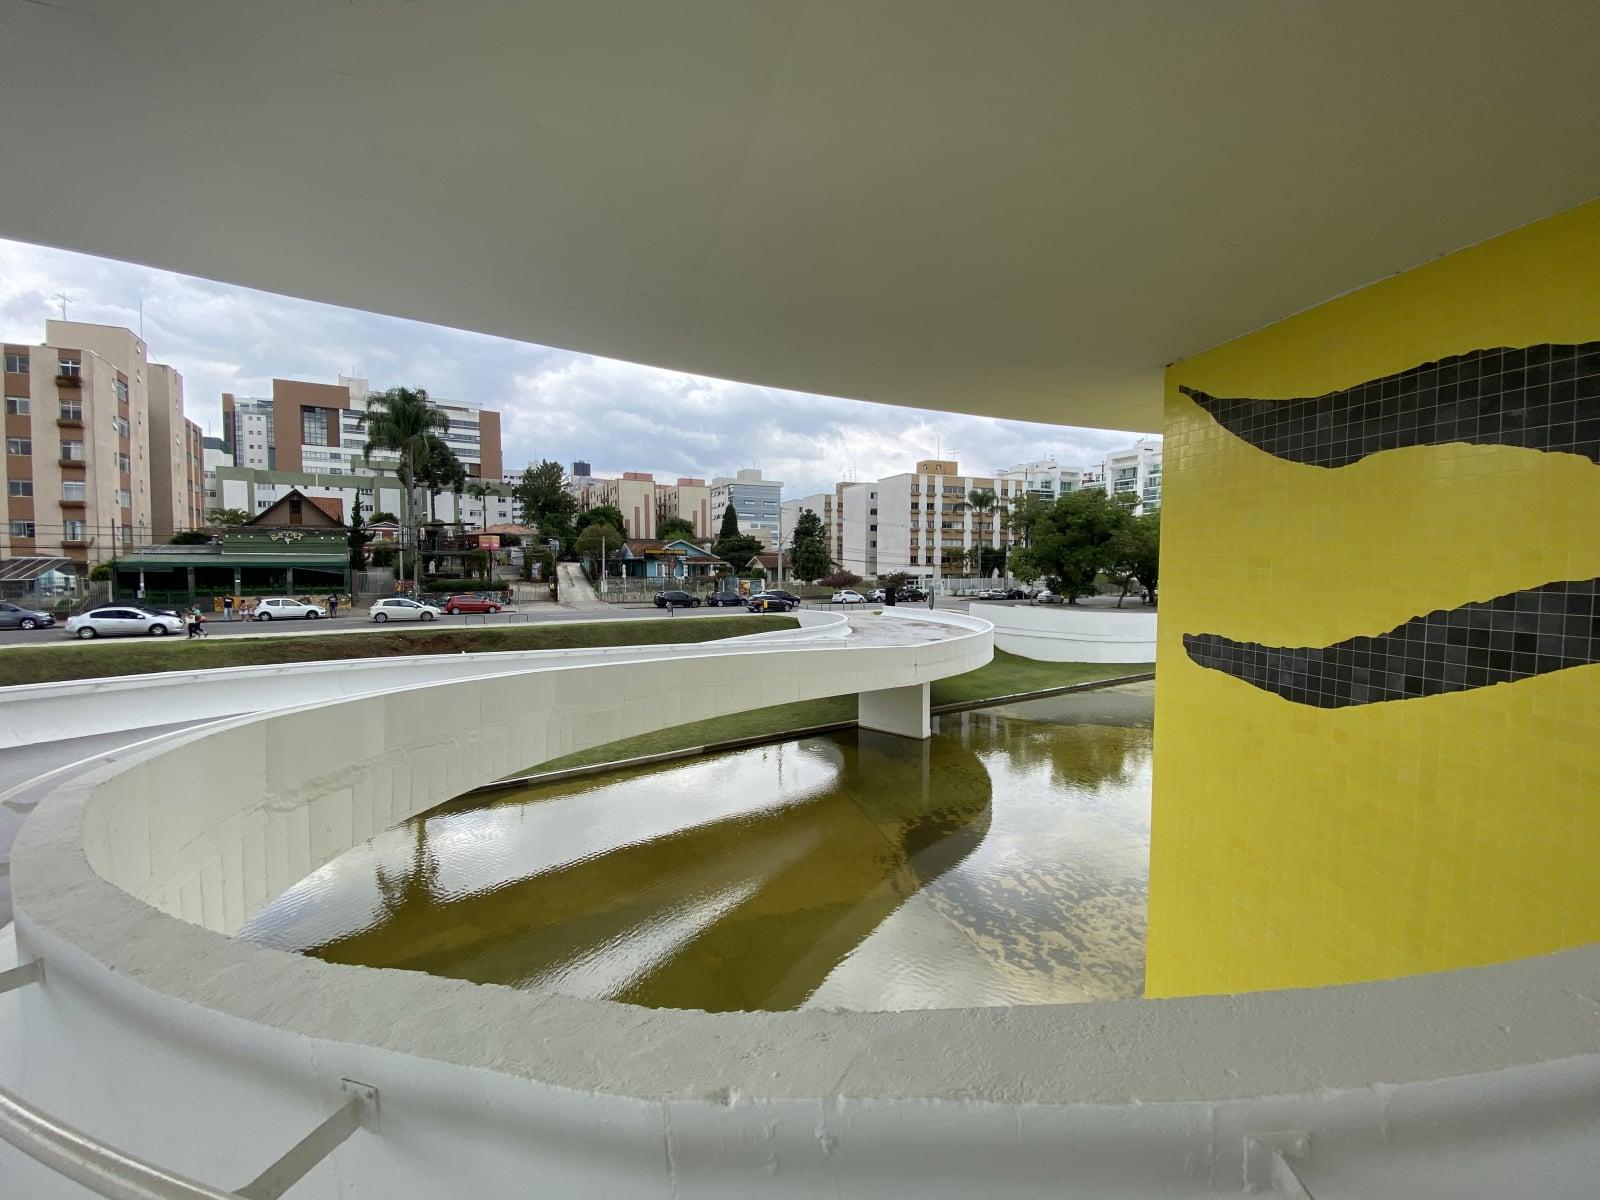 Museu-Oscar-Niemeyer